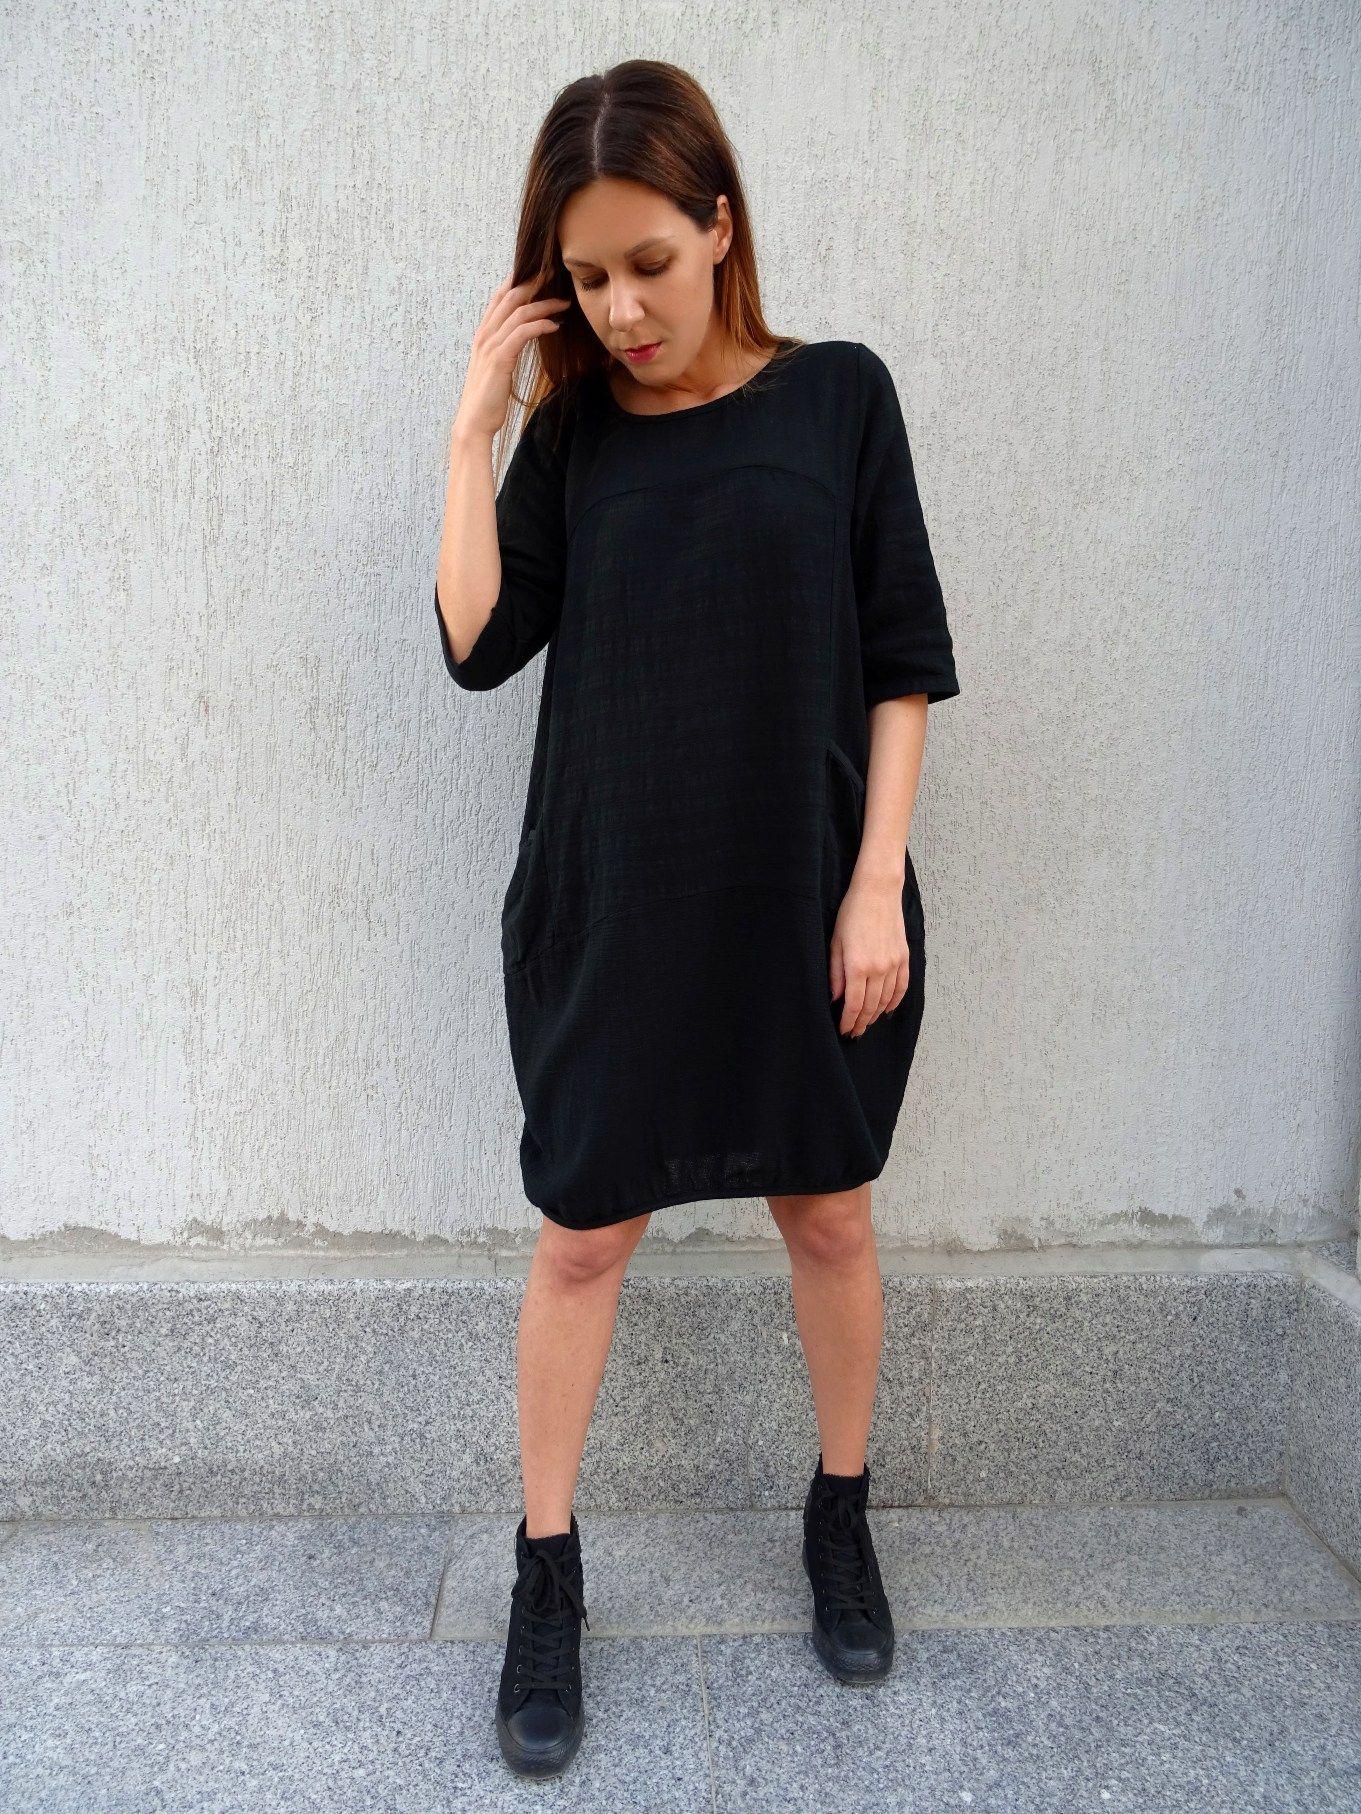 Black dresstunic dressoversize dressplus size dresscotton dress